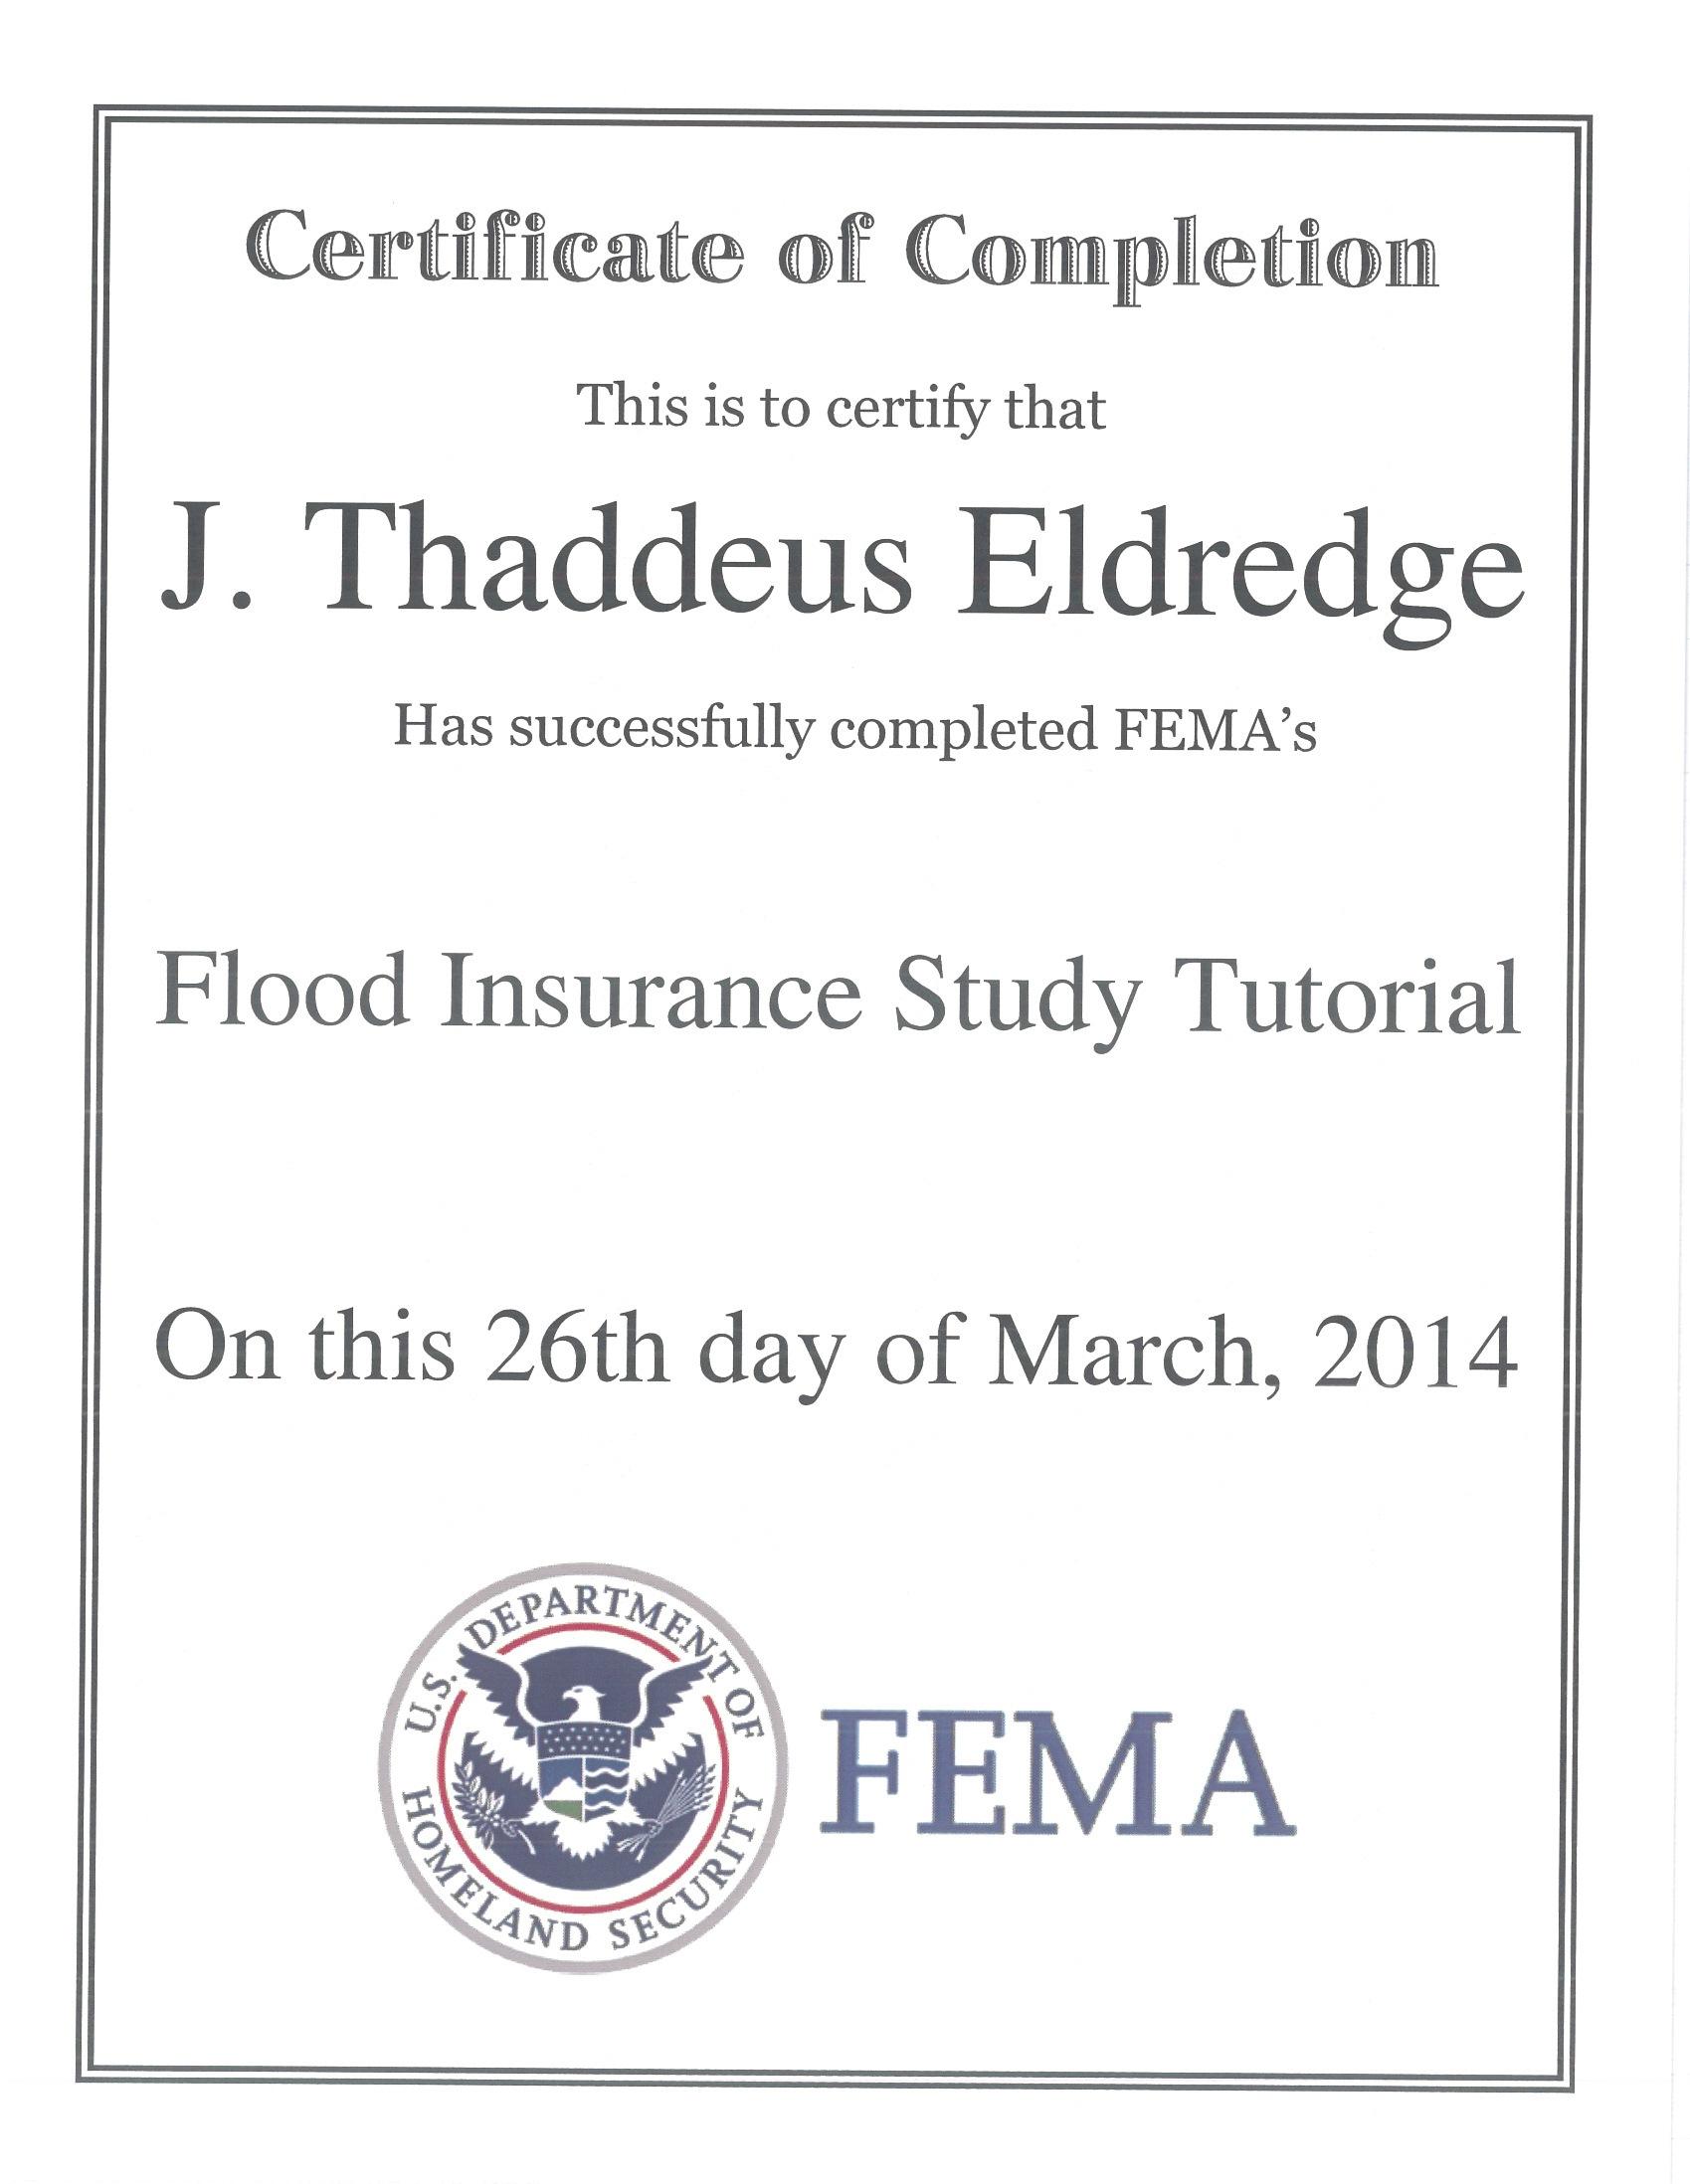 2014-03-26 FEMA Flood Insurance Study.jpg